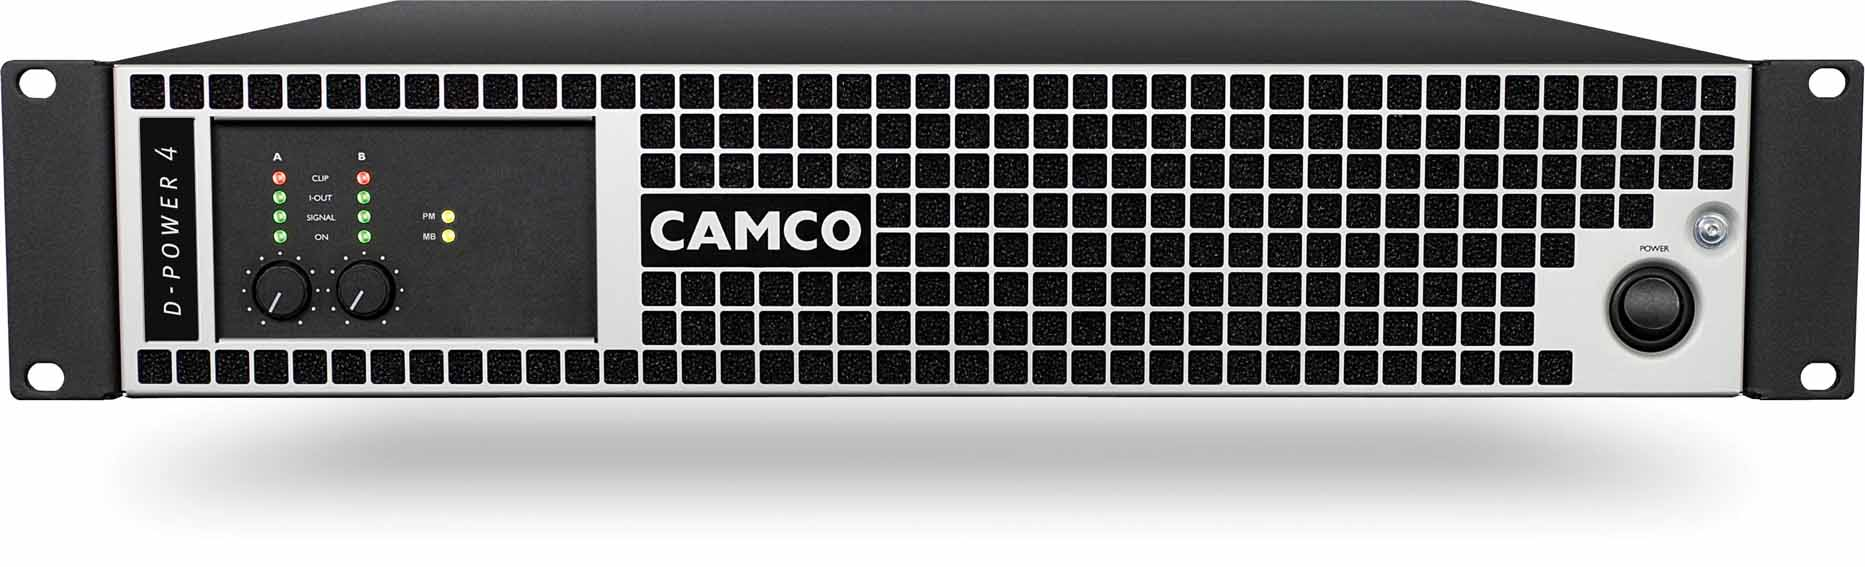 D Power 4 Camco D Power 4 Audiofanzine